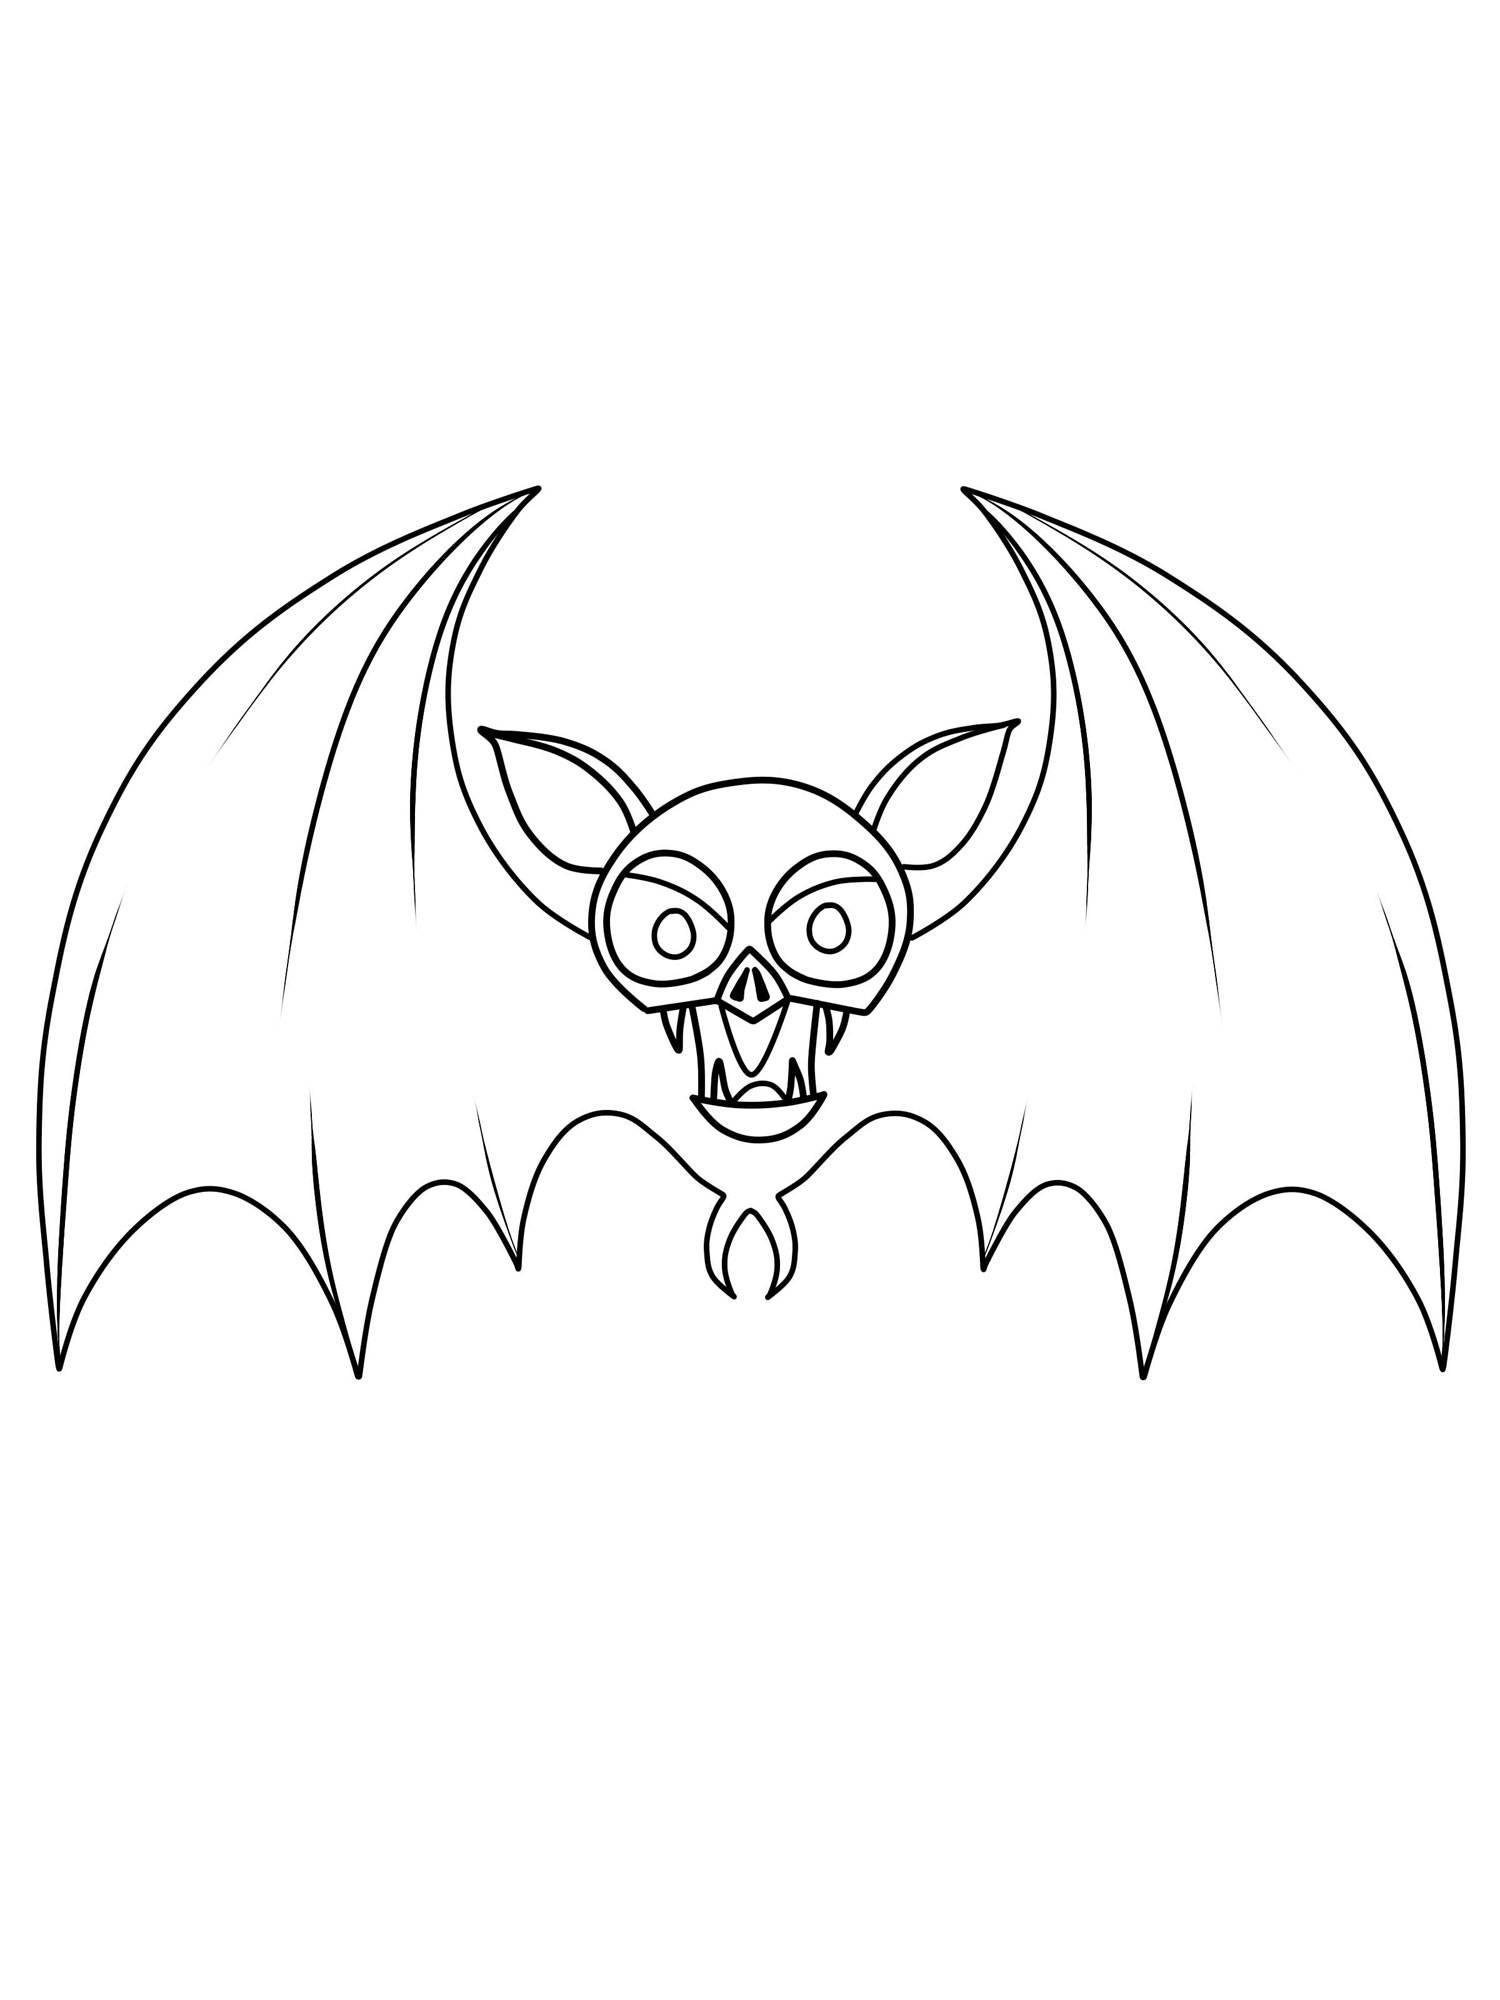 Ausmalbild Halloween Fledermaus kostenlos ausdrucken